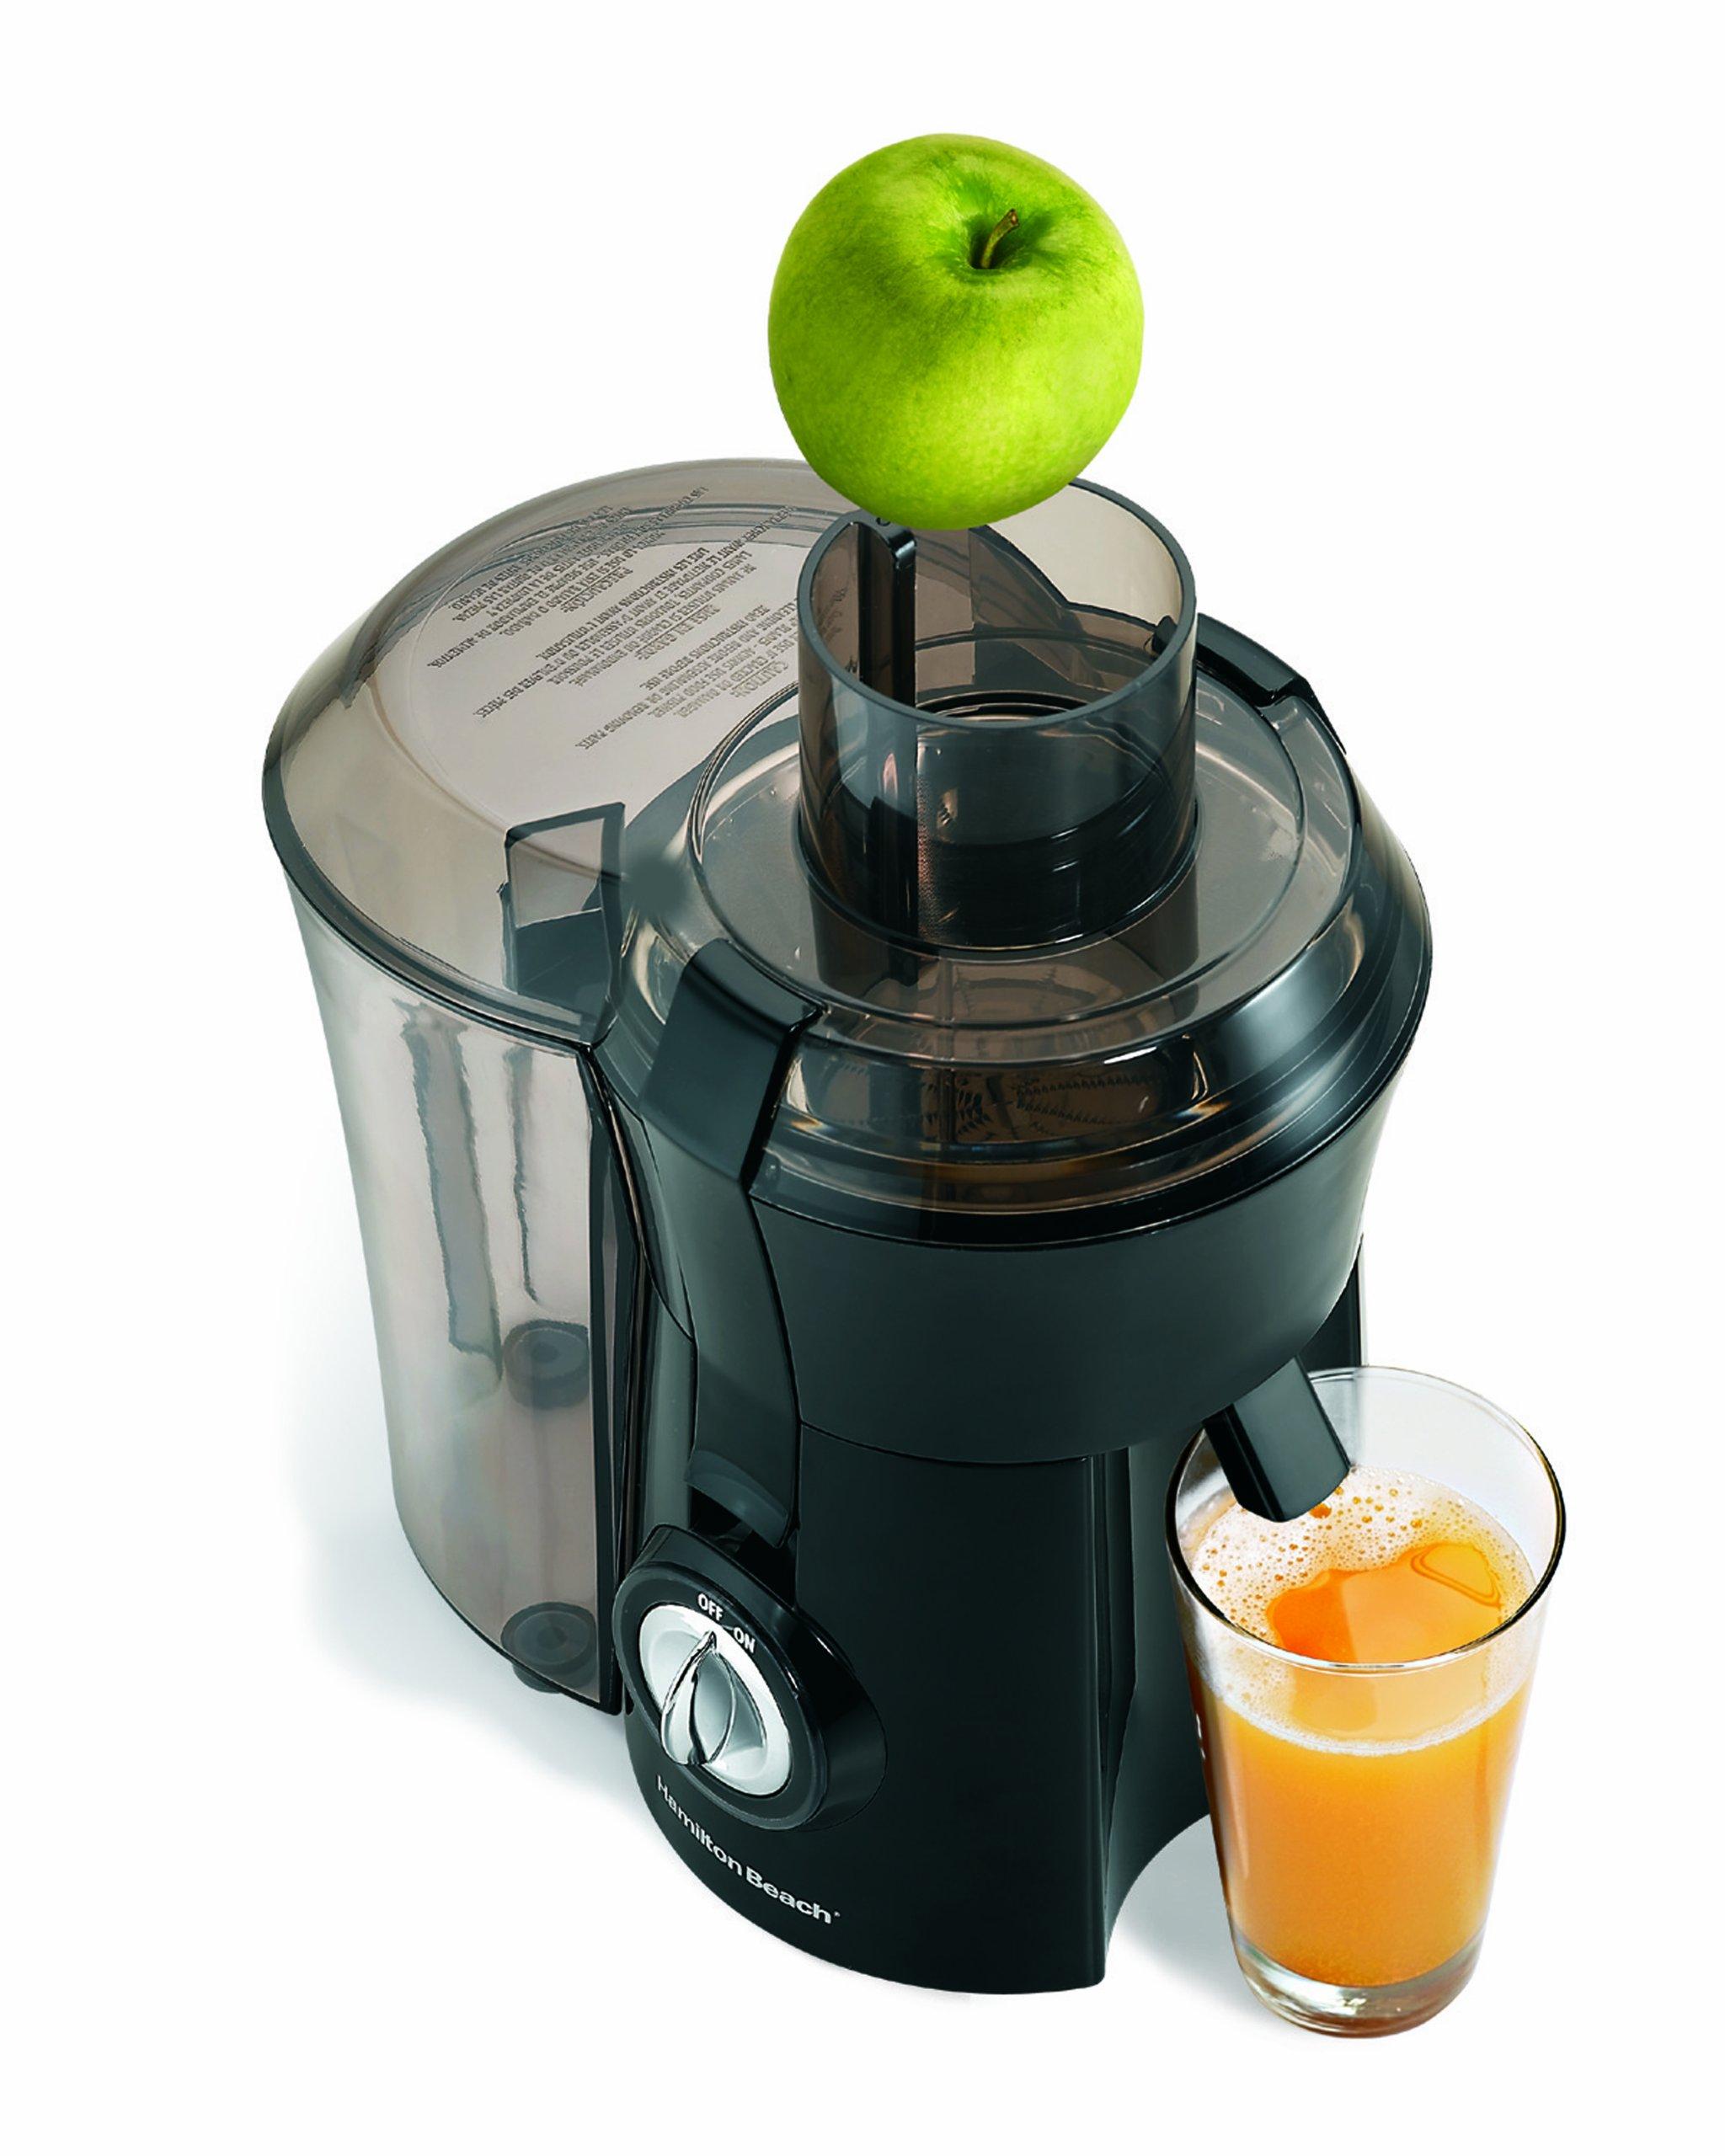 Hamilton Beach 67601 Big Mouth Juice Extractor, Black (Discontinued)